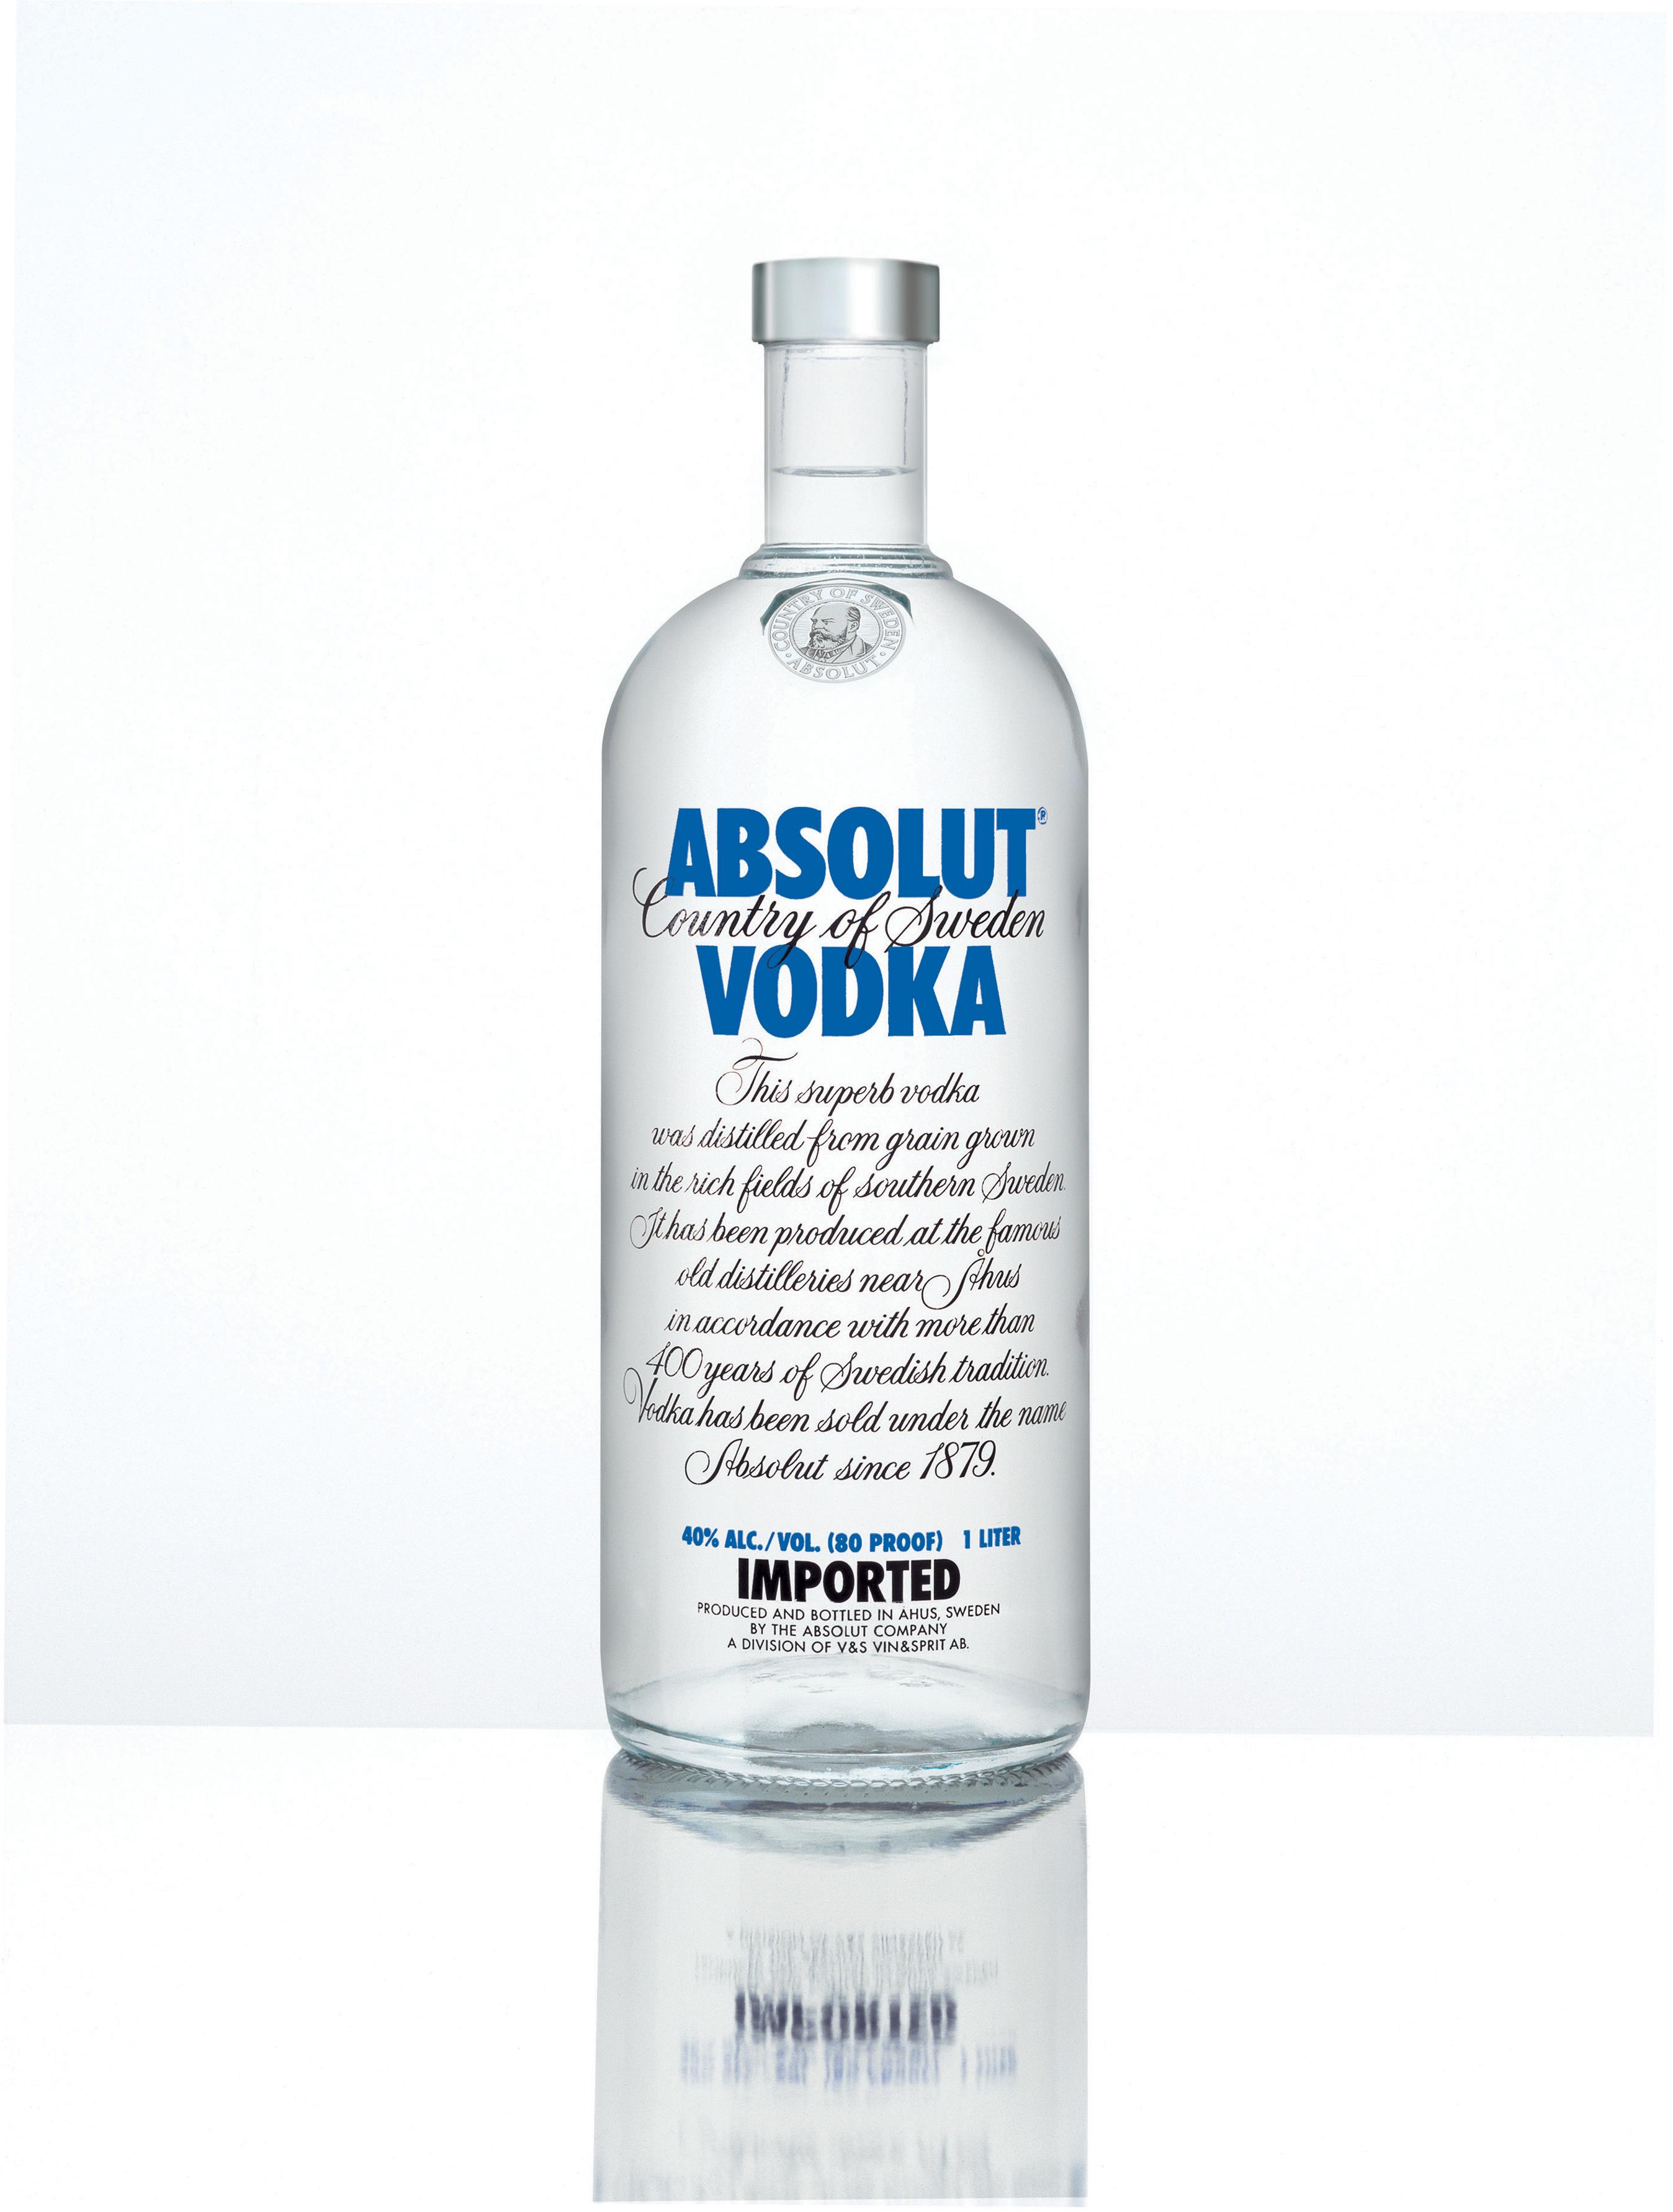 ABSOLUT Vodka va lansa 4 milioane de ambalaje ABSOLUT unice